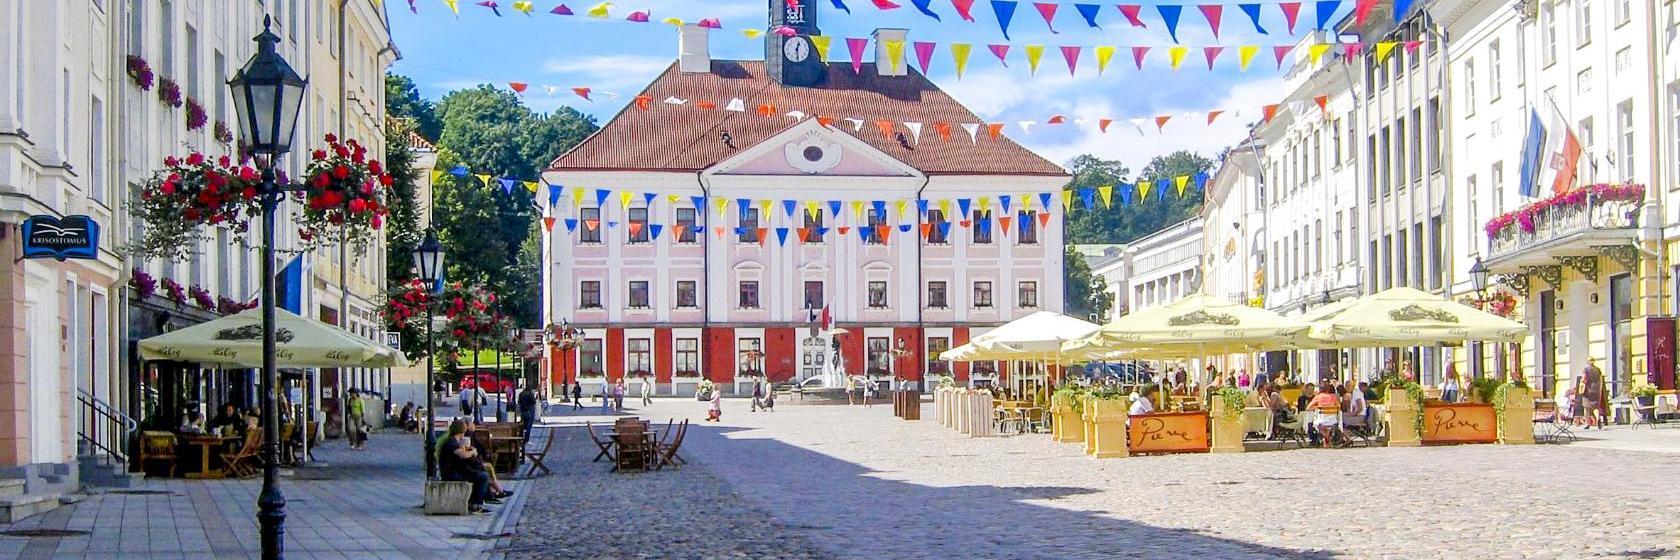 10 Parasta Hotellia Tartossa Virossa Hinnat Alkaen 25